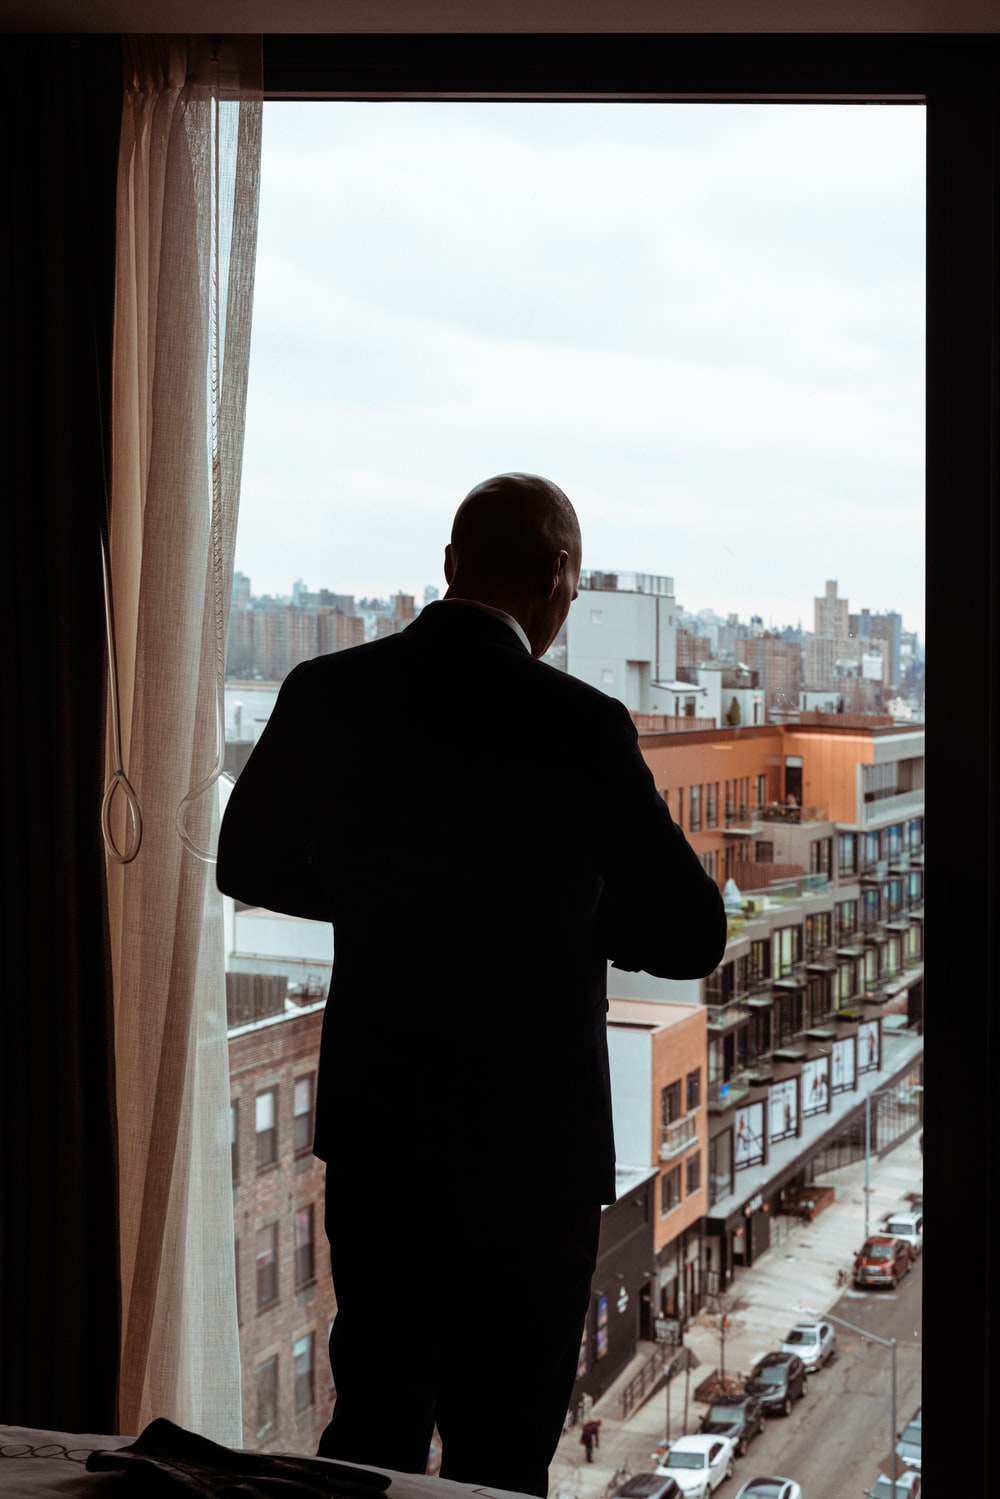 man in black dress shirt standing near window during daytime